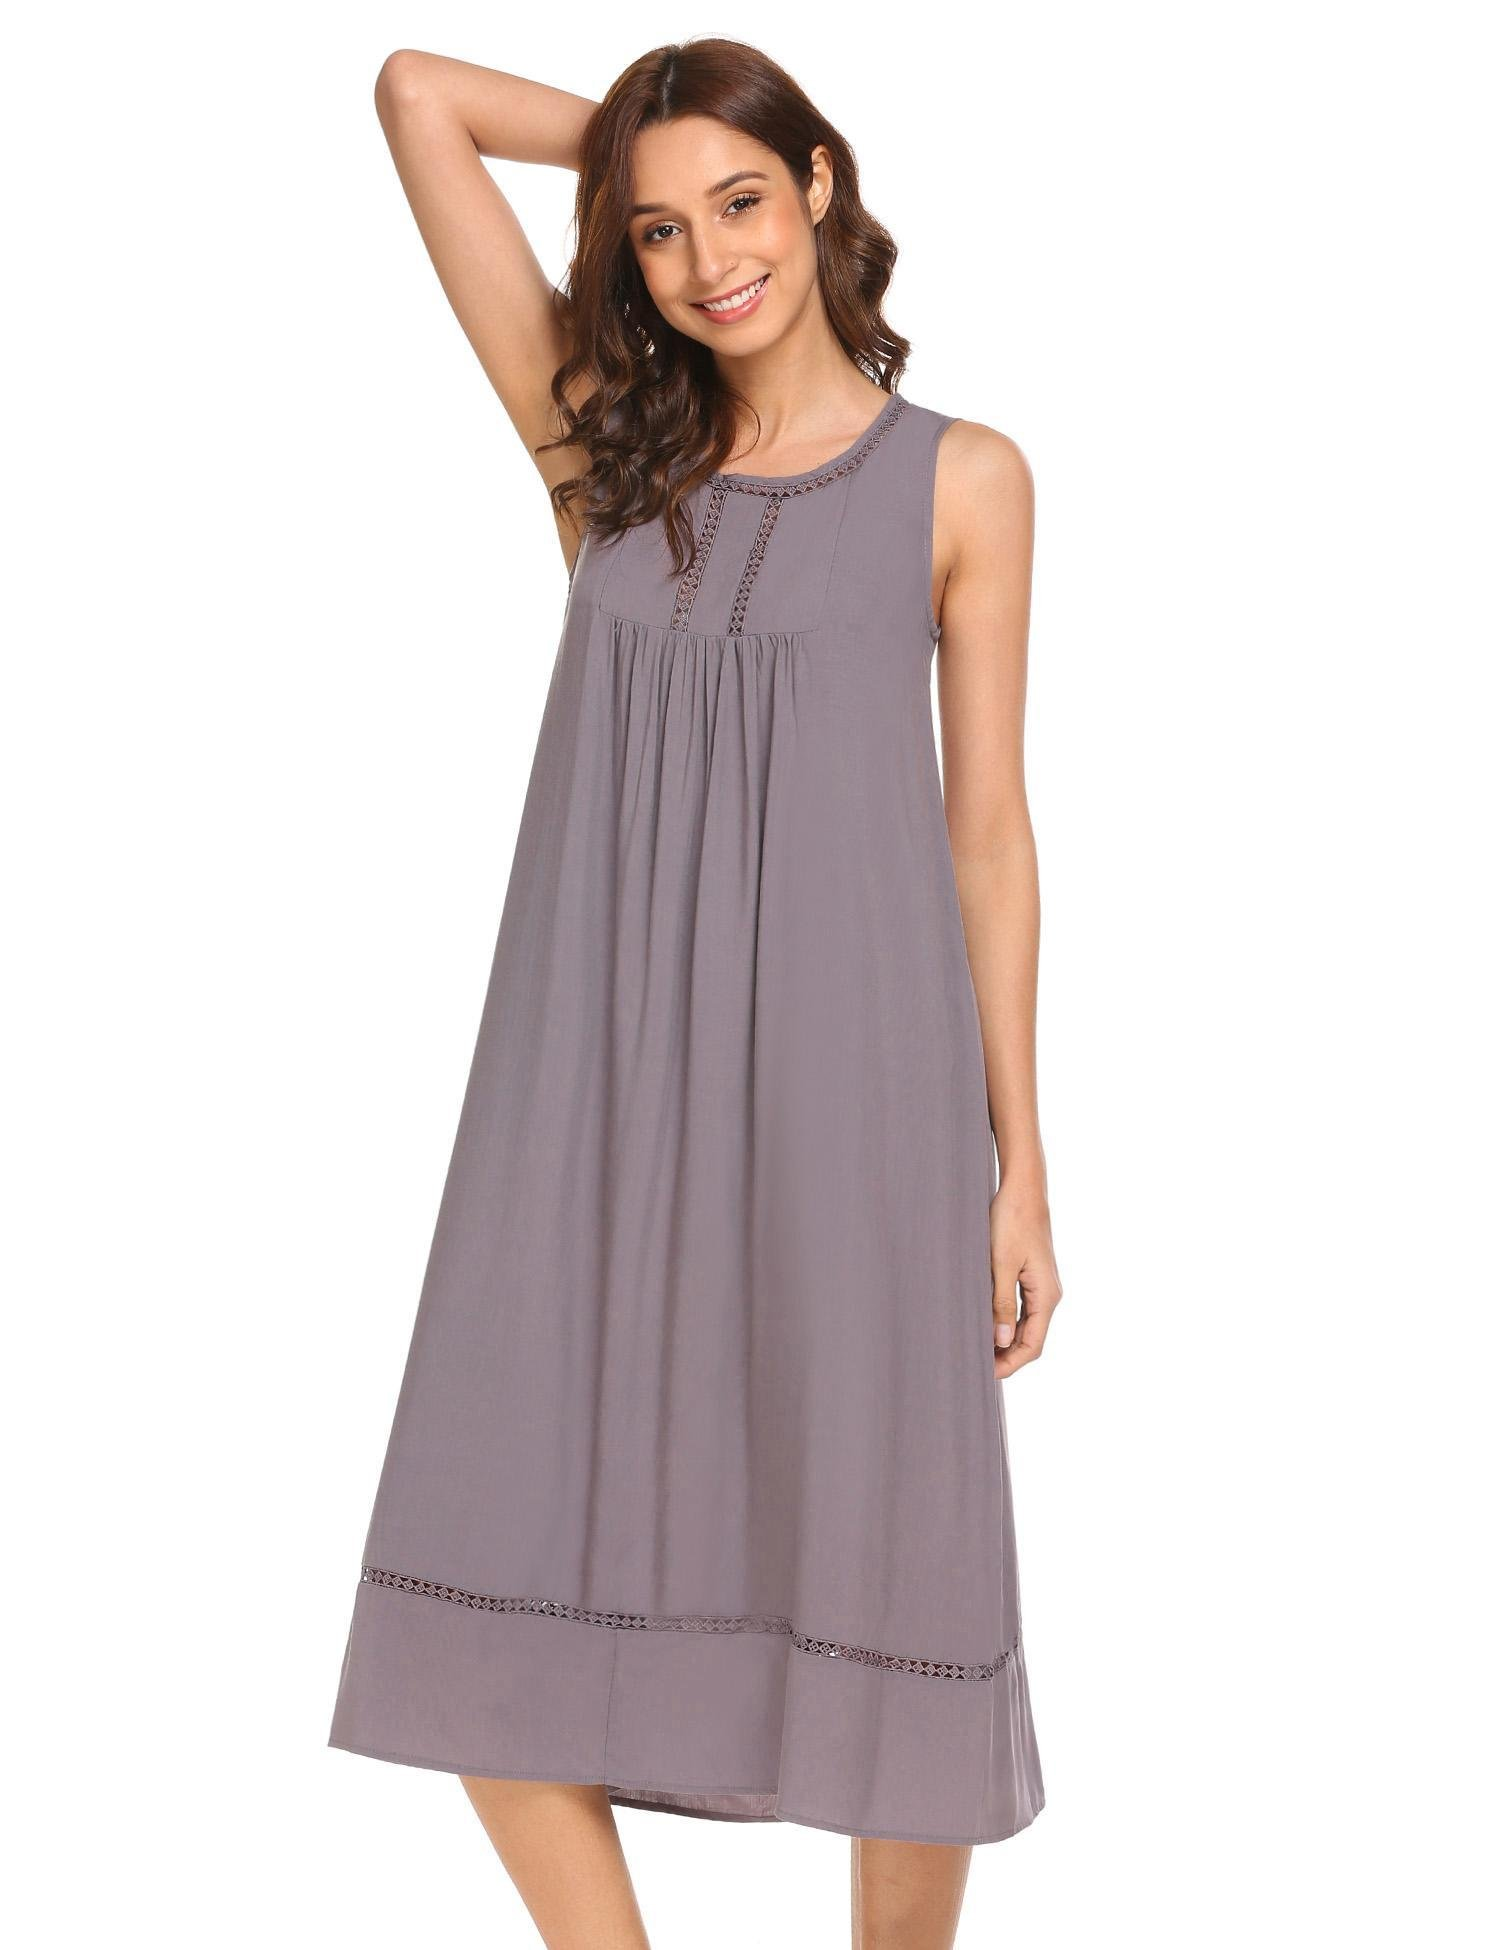 Ekouaer Ekoauer Womens Anna Cotton Nightgown, Sleeveless Victorian Sleepwear